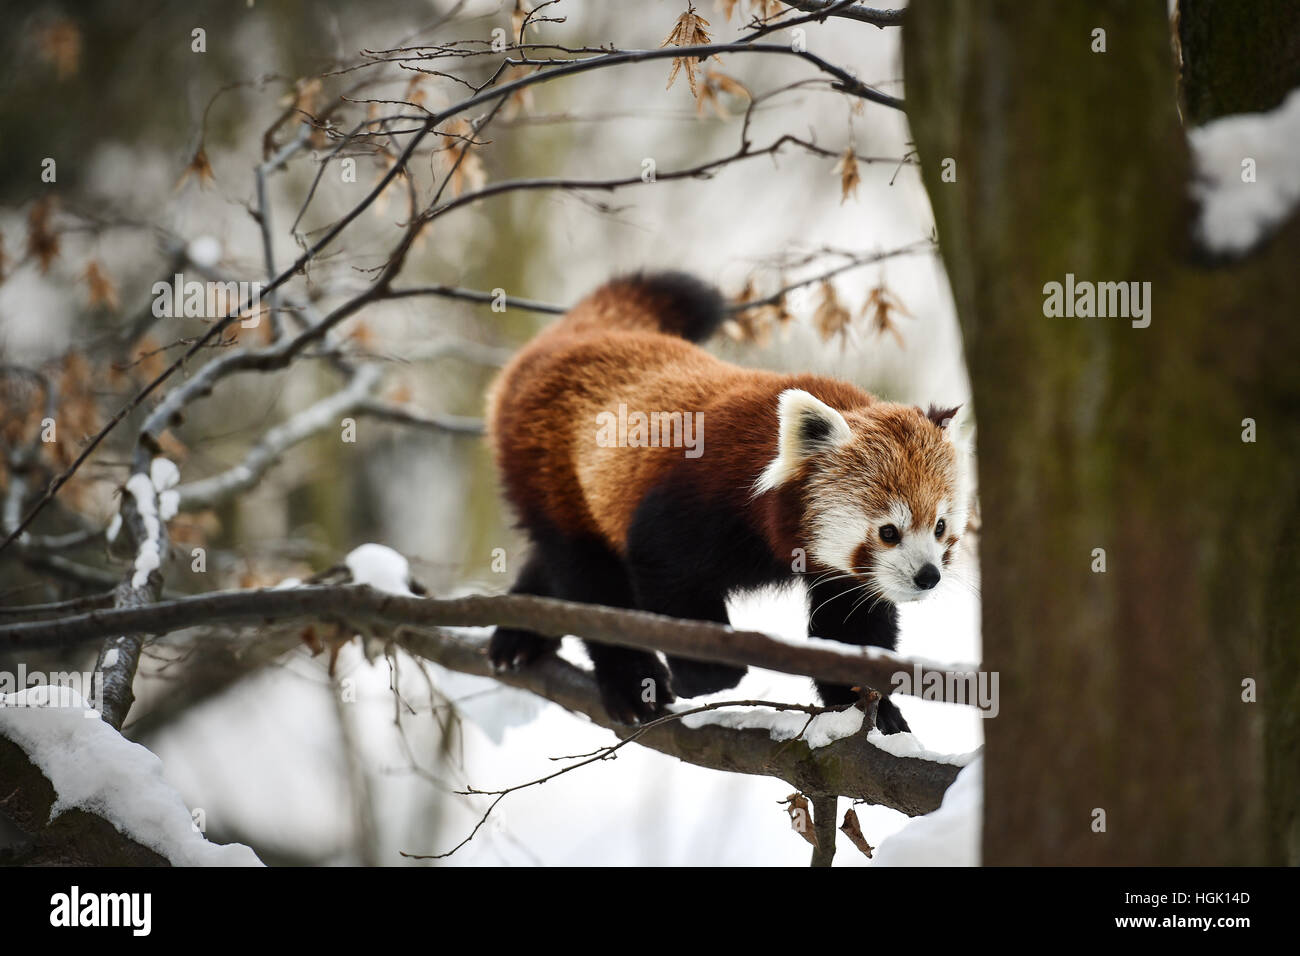 Liberec, Czech Republic. 23rd Jan, 2017. Red panda, Ailurus fulgens, enjoys a snowy day in Liberec Zoo, Czech Republic, - Stock Image